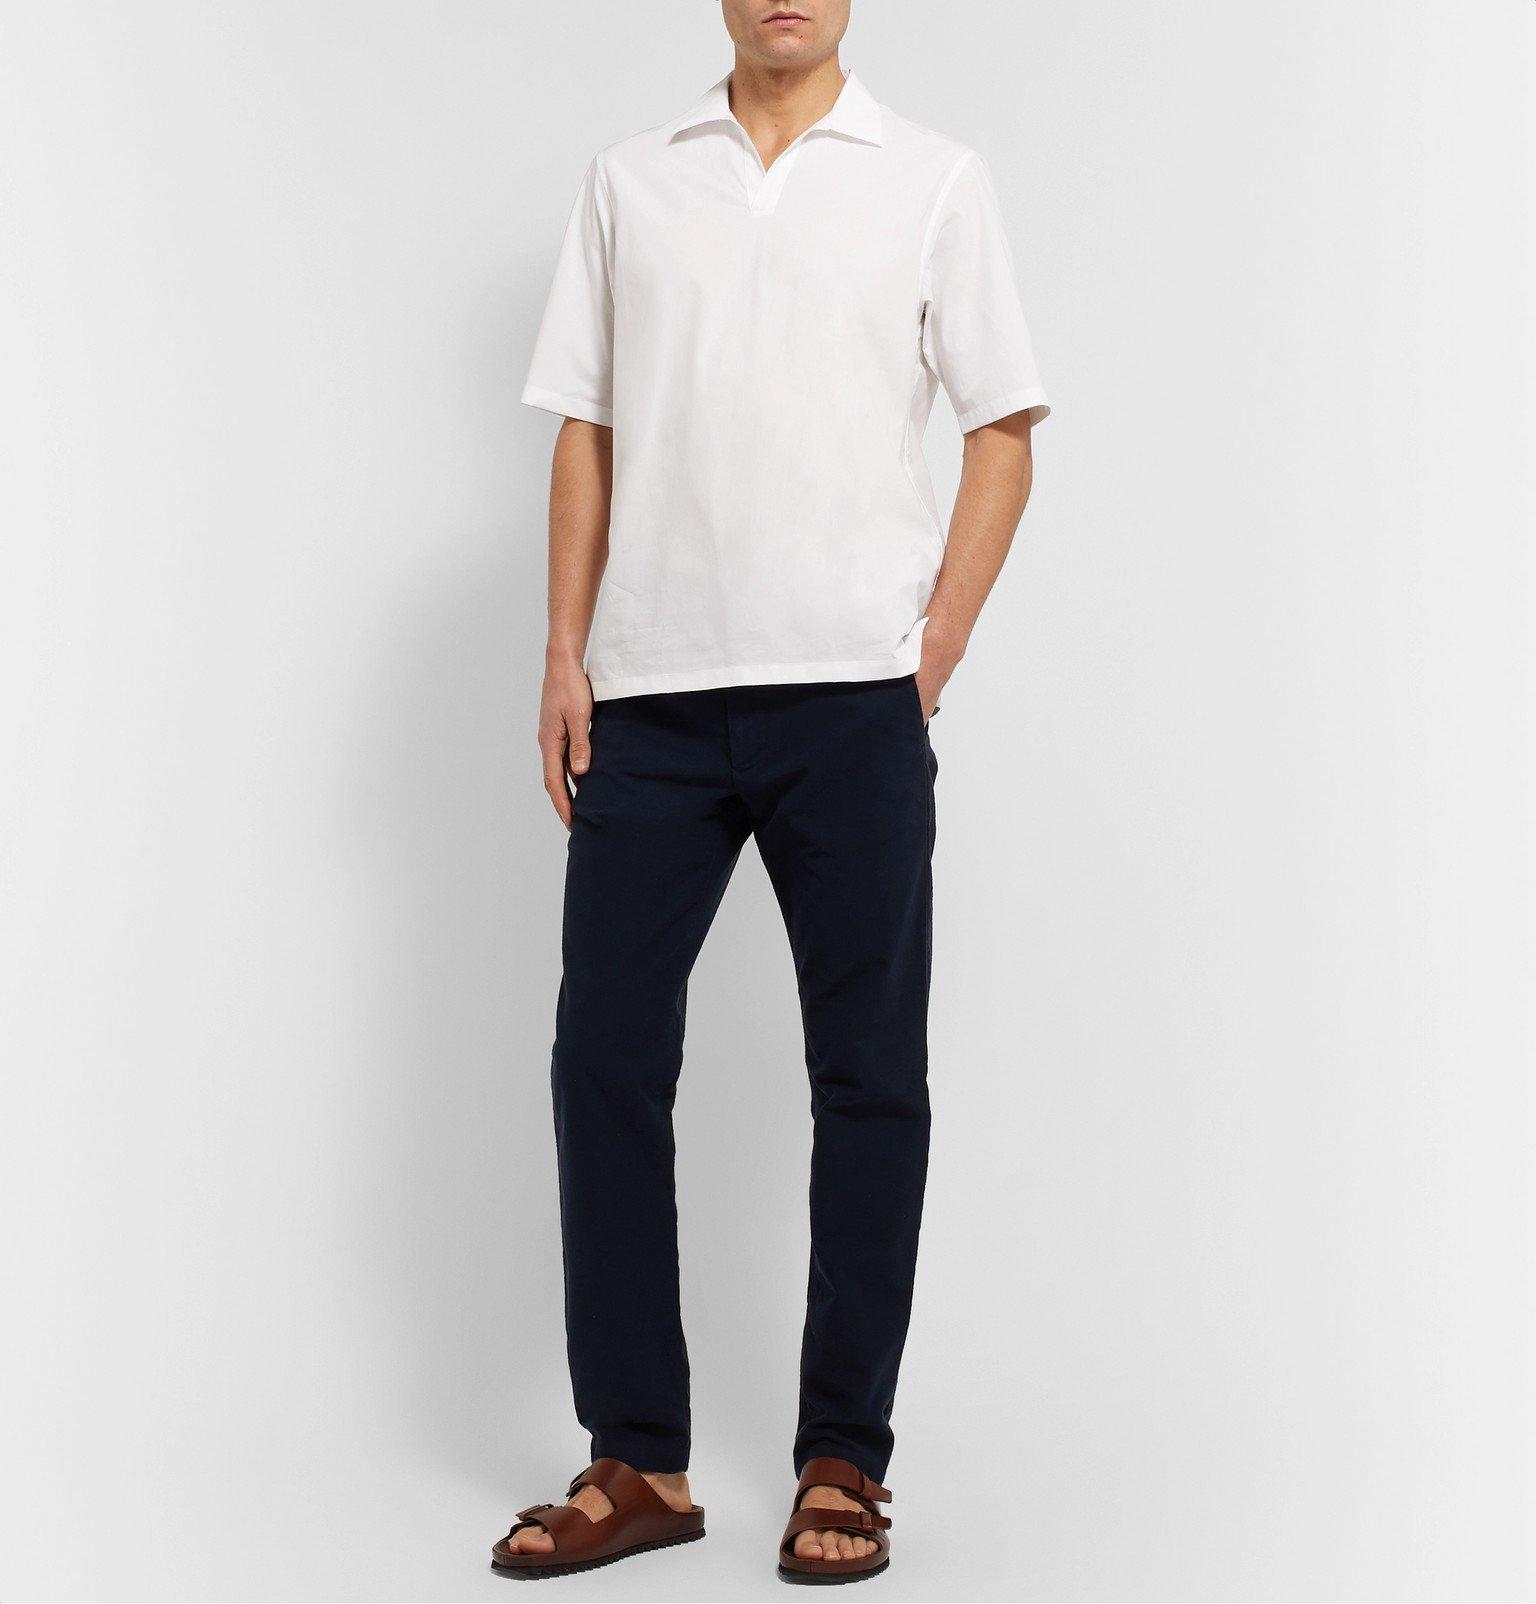 Officine Generale - Yann Cotton-Poplin Shirt - White